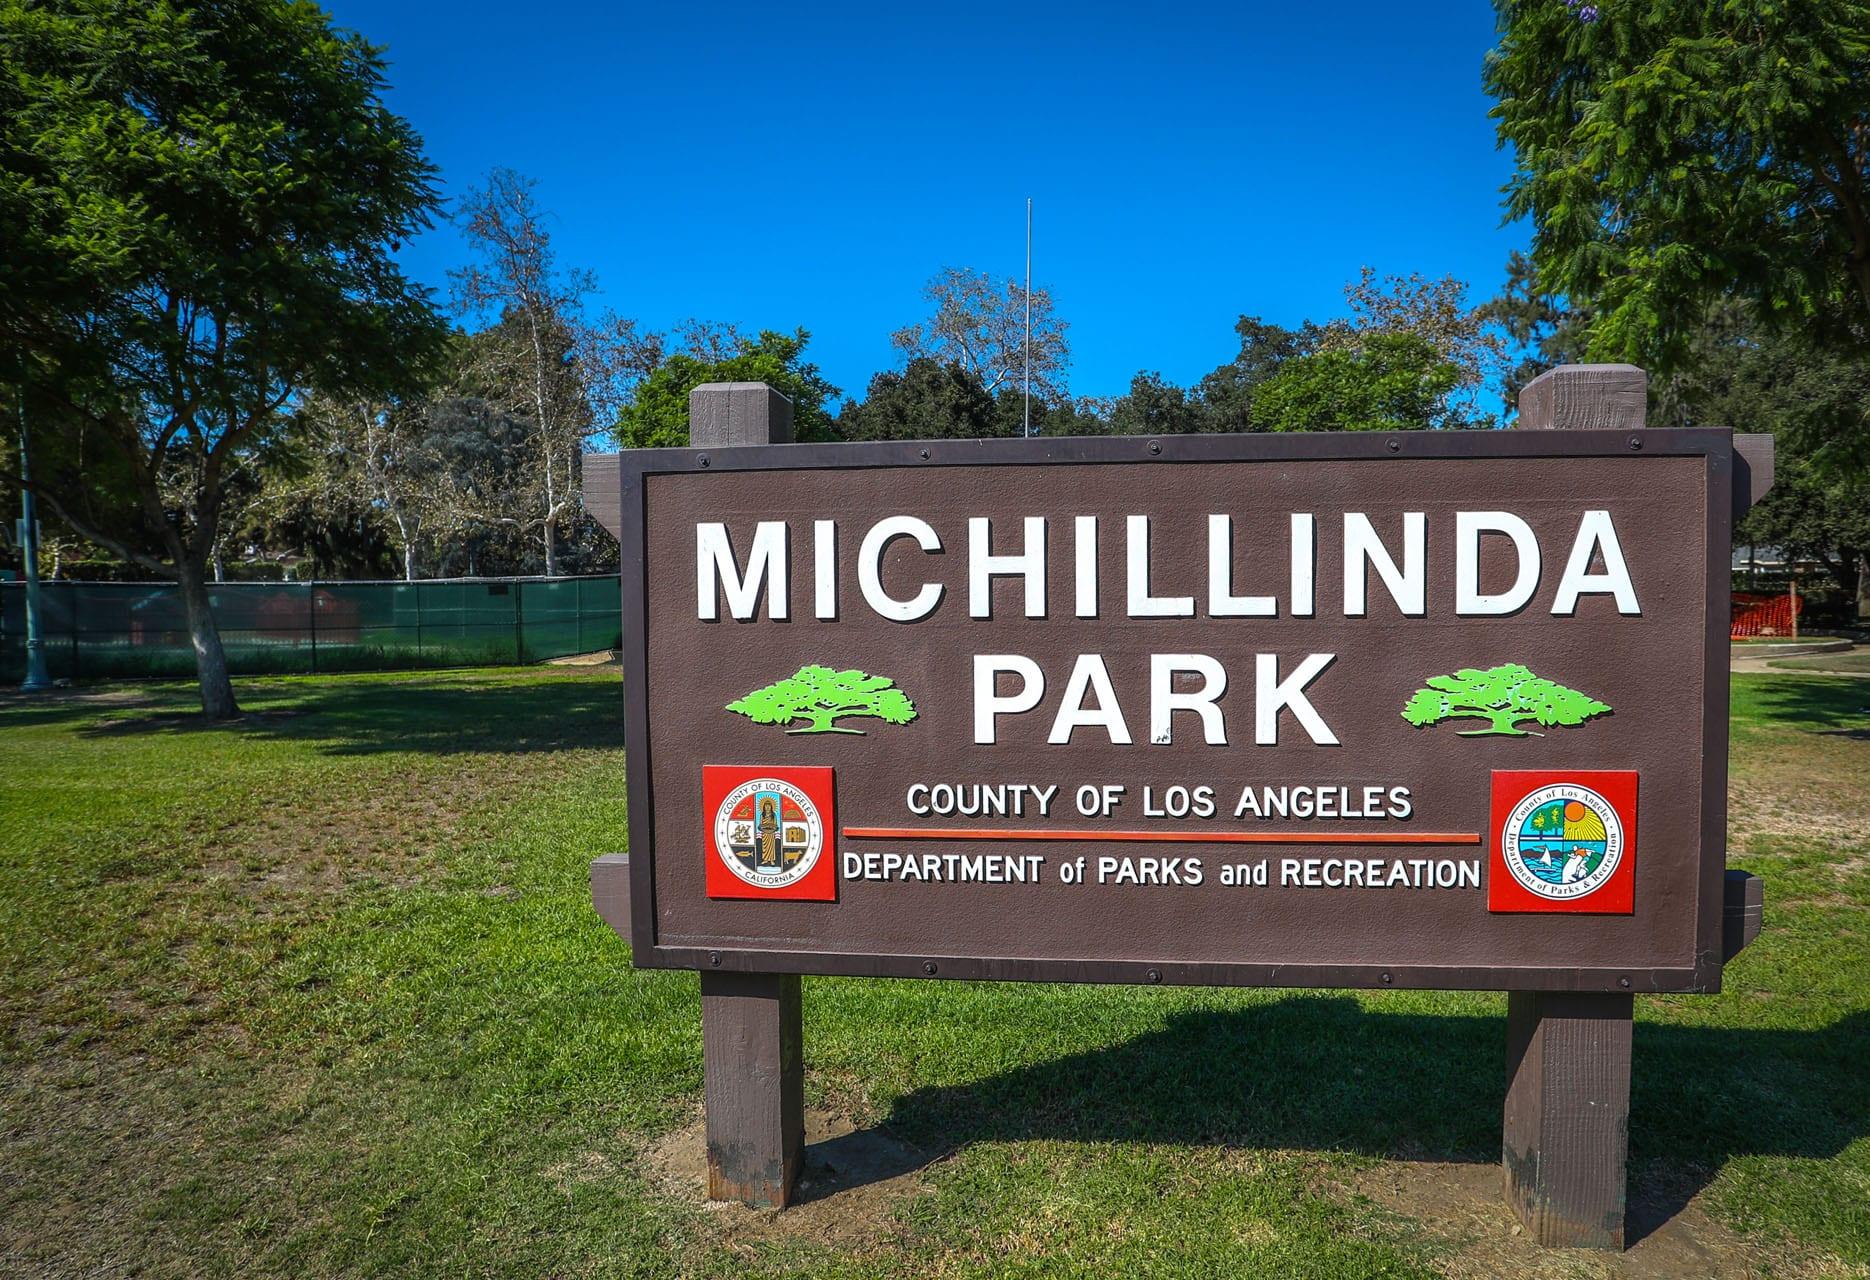 Michillinda Park sign in grass